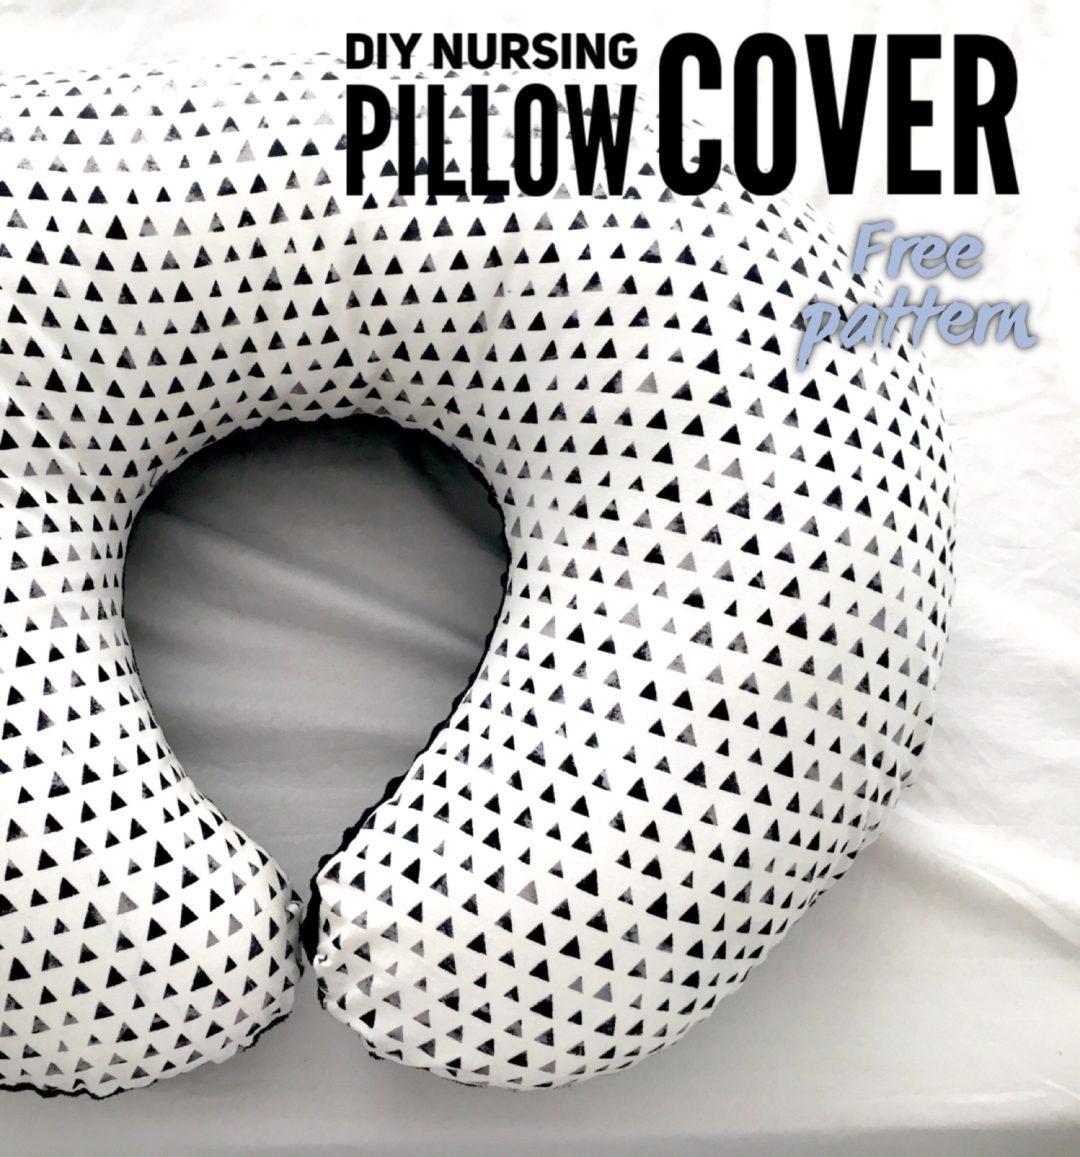 Diy Nursing Pillow Cover Life On Waller